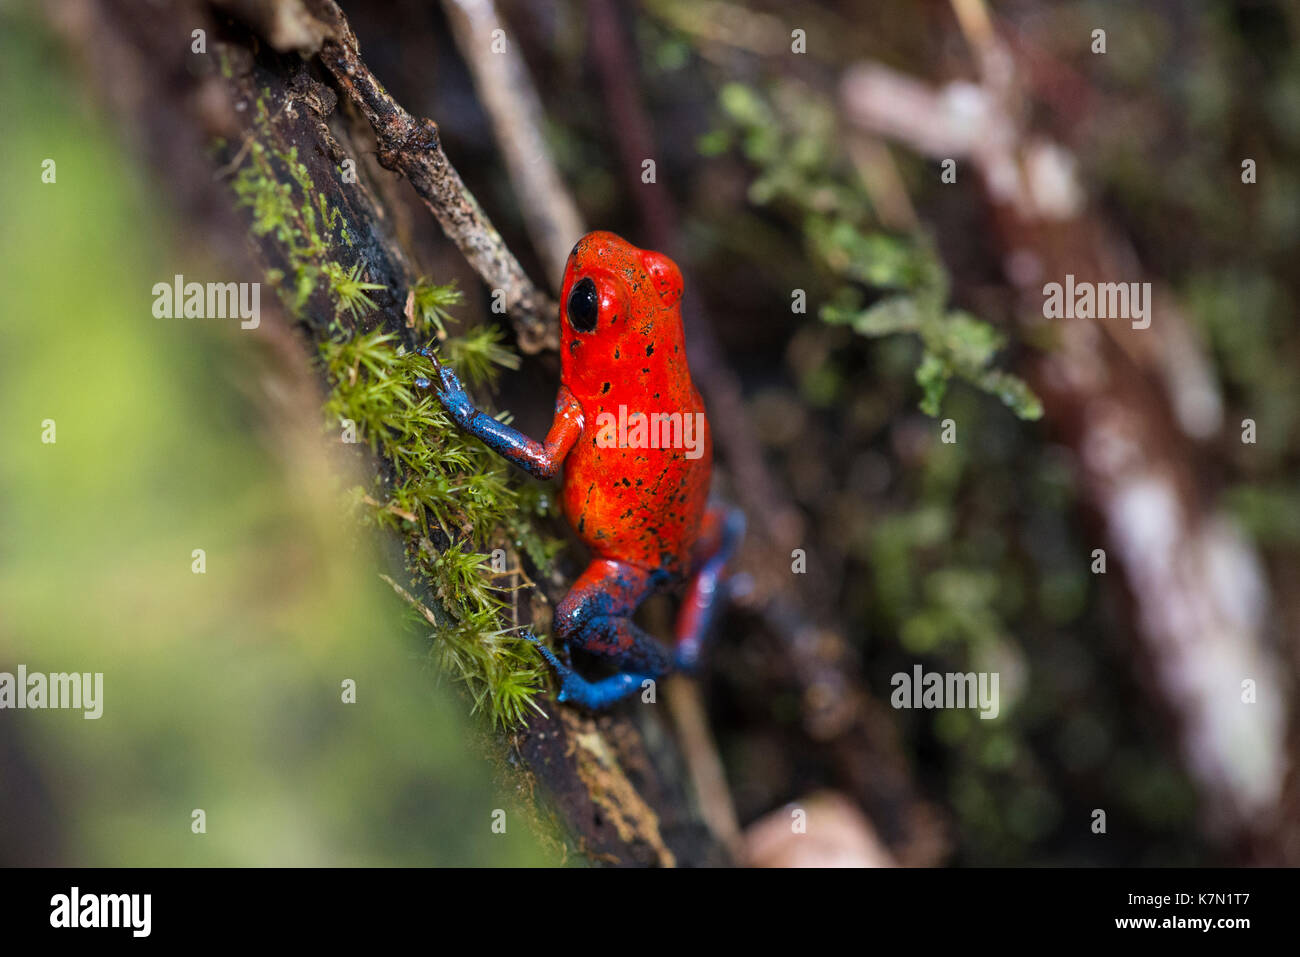 Strawberry poison-dart frog (Dendrobates pumilio), Costa Rica, Central America - Stock Image